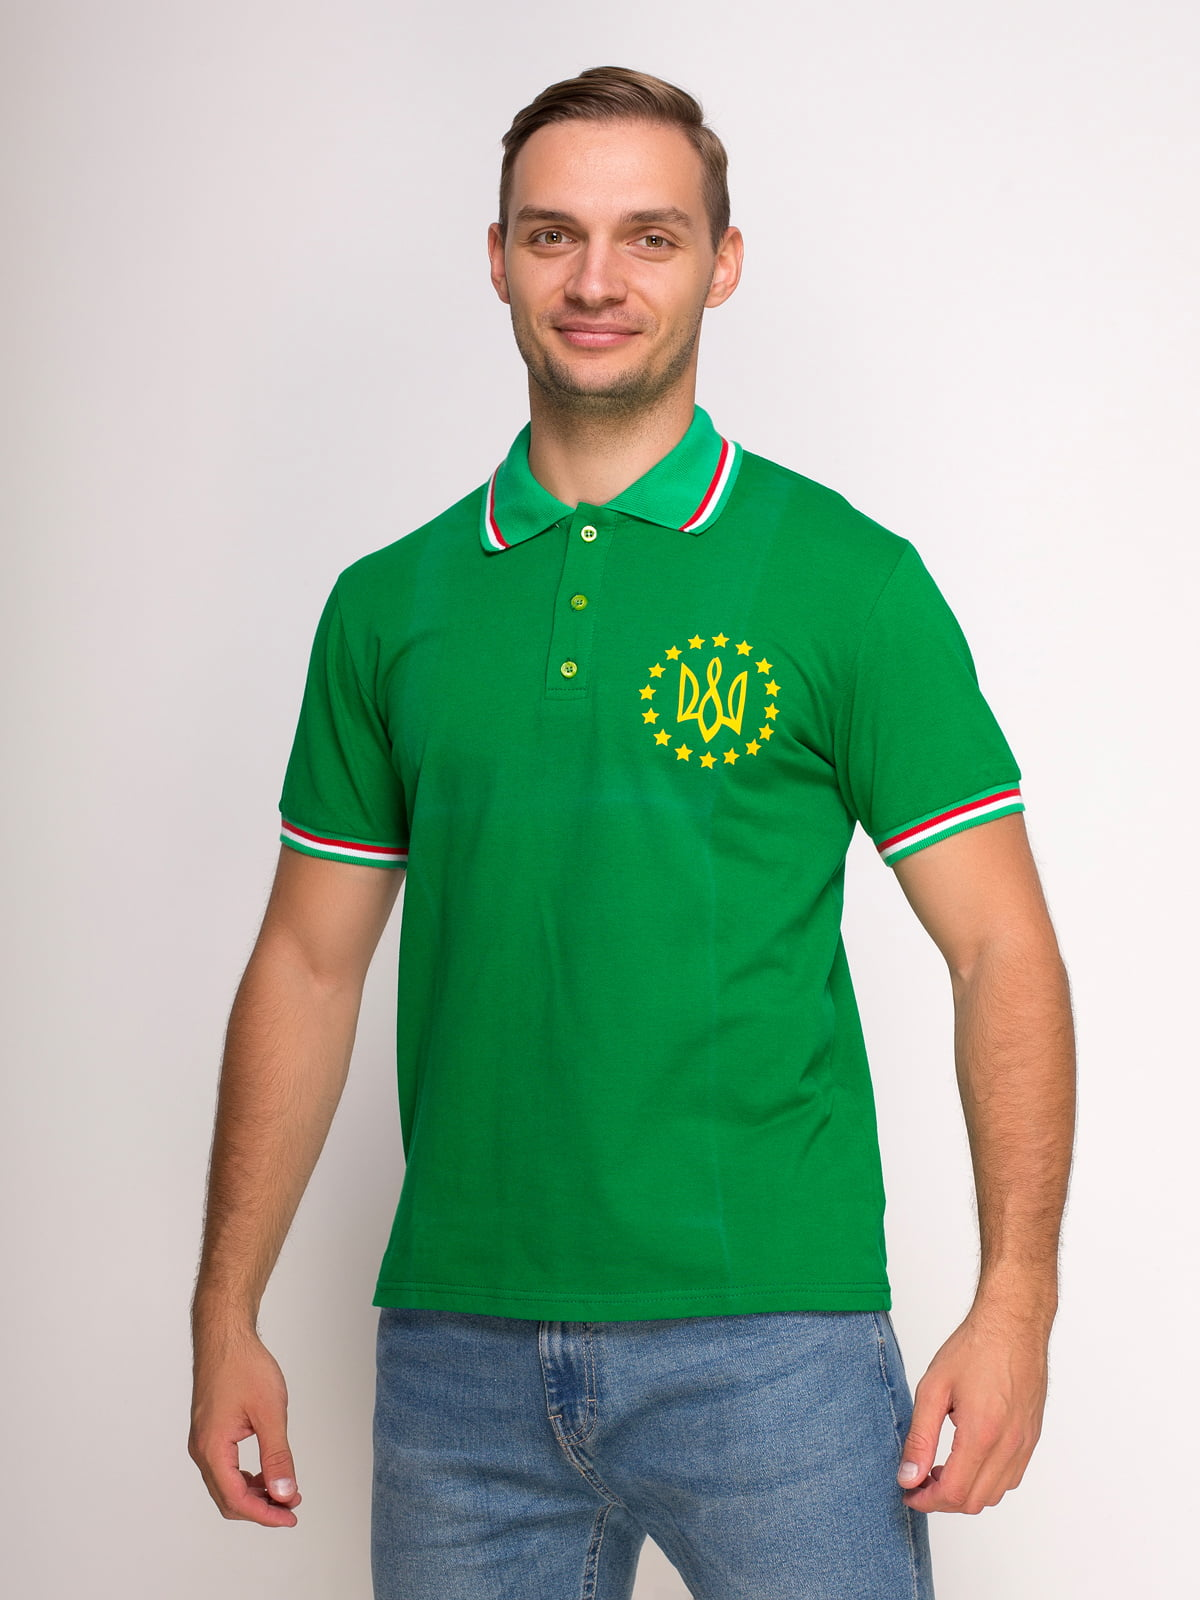 Футболка-поло зелена з принтом | 4583045